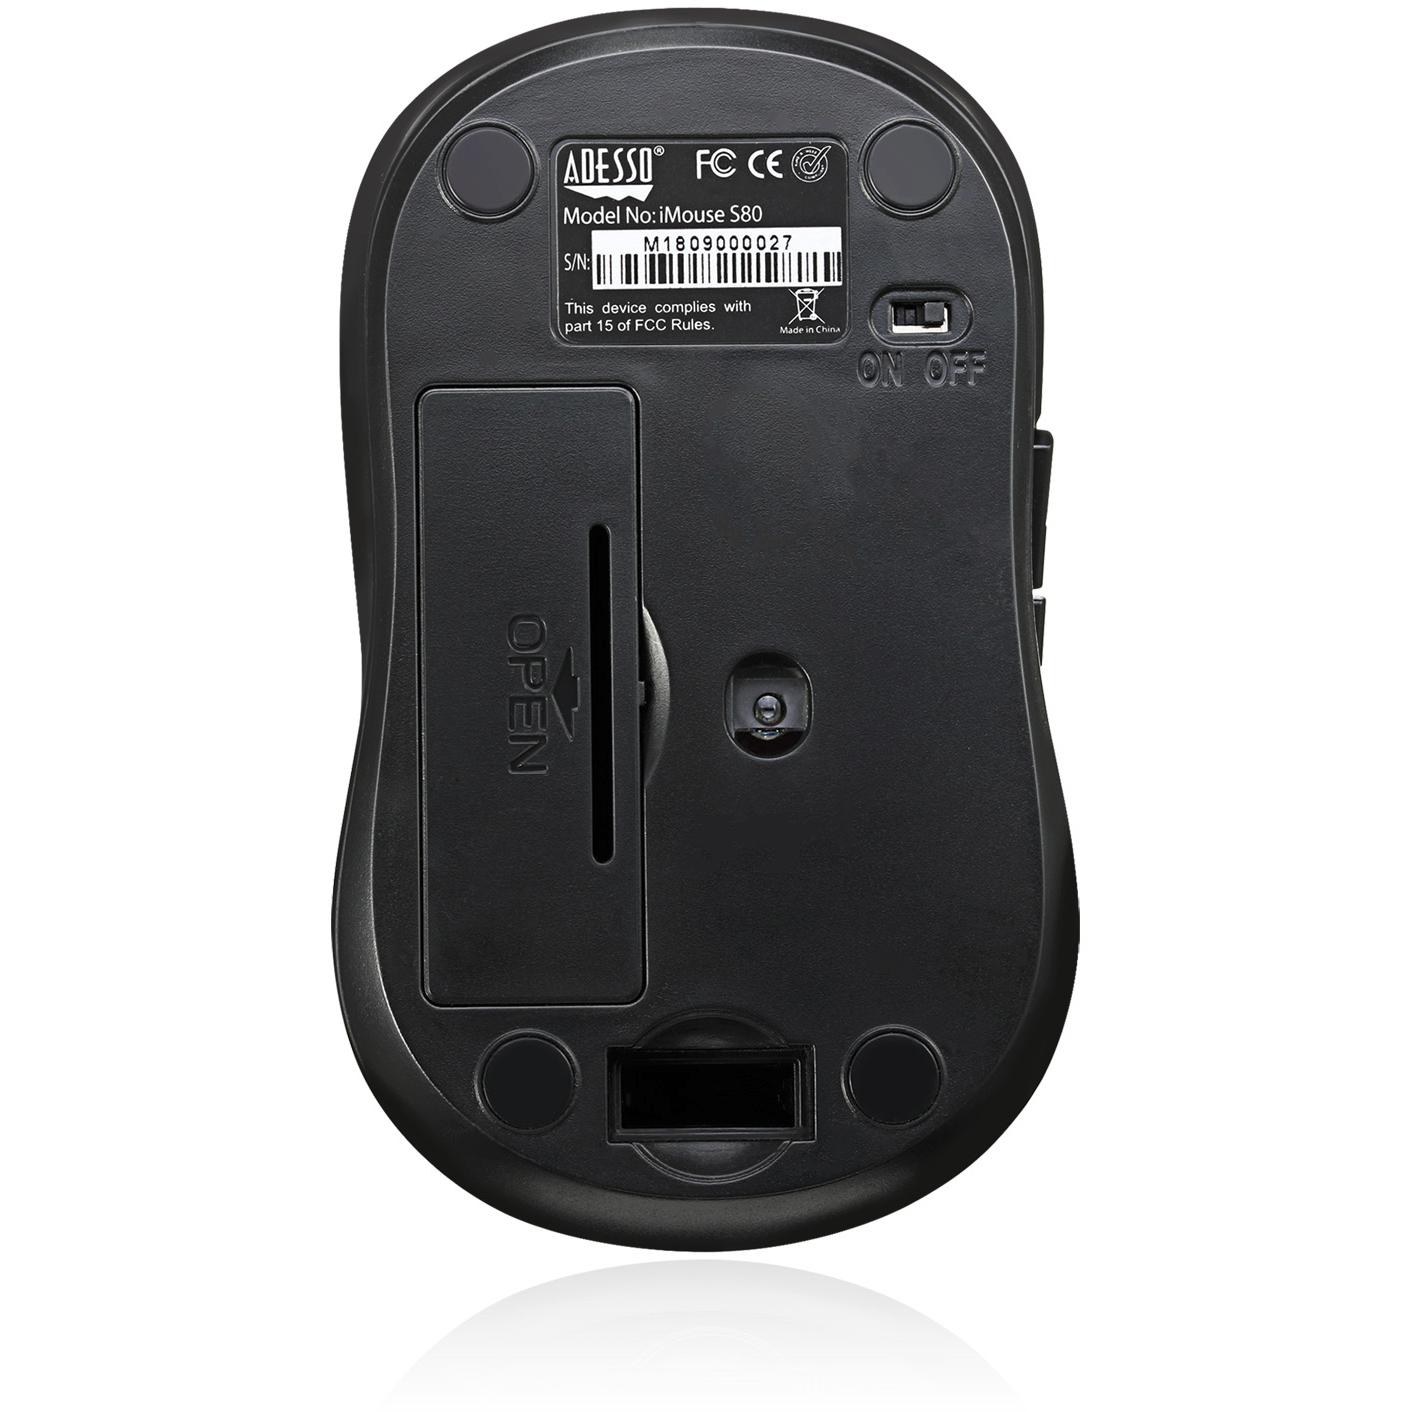 Adesso IMouse S80B   Wireless Fabric Optical Mini Mouse (Black) Alternate-Image3